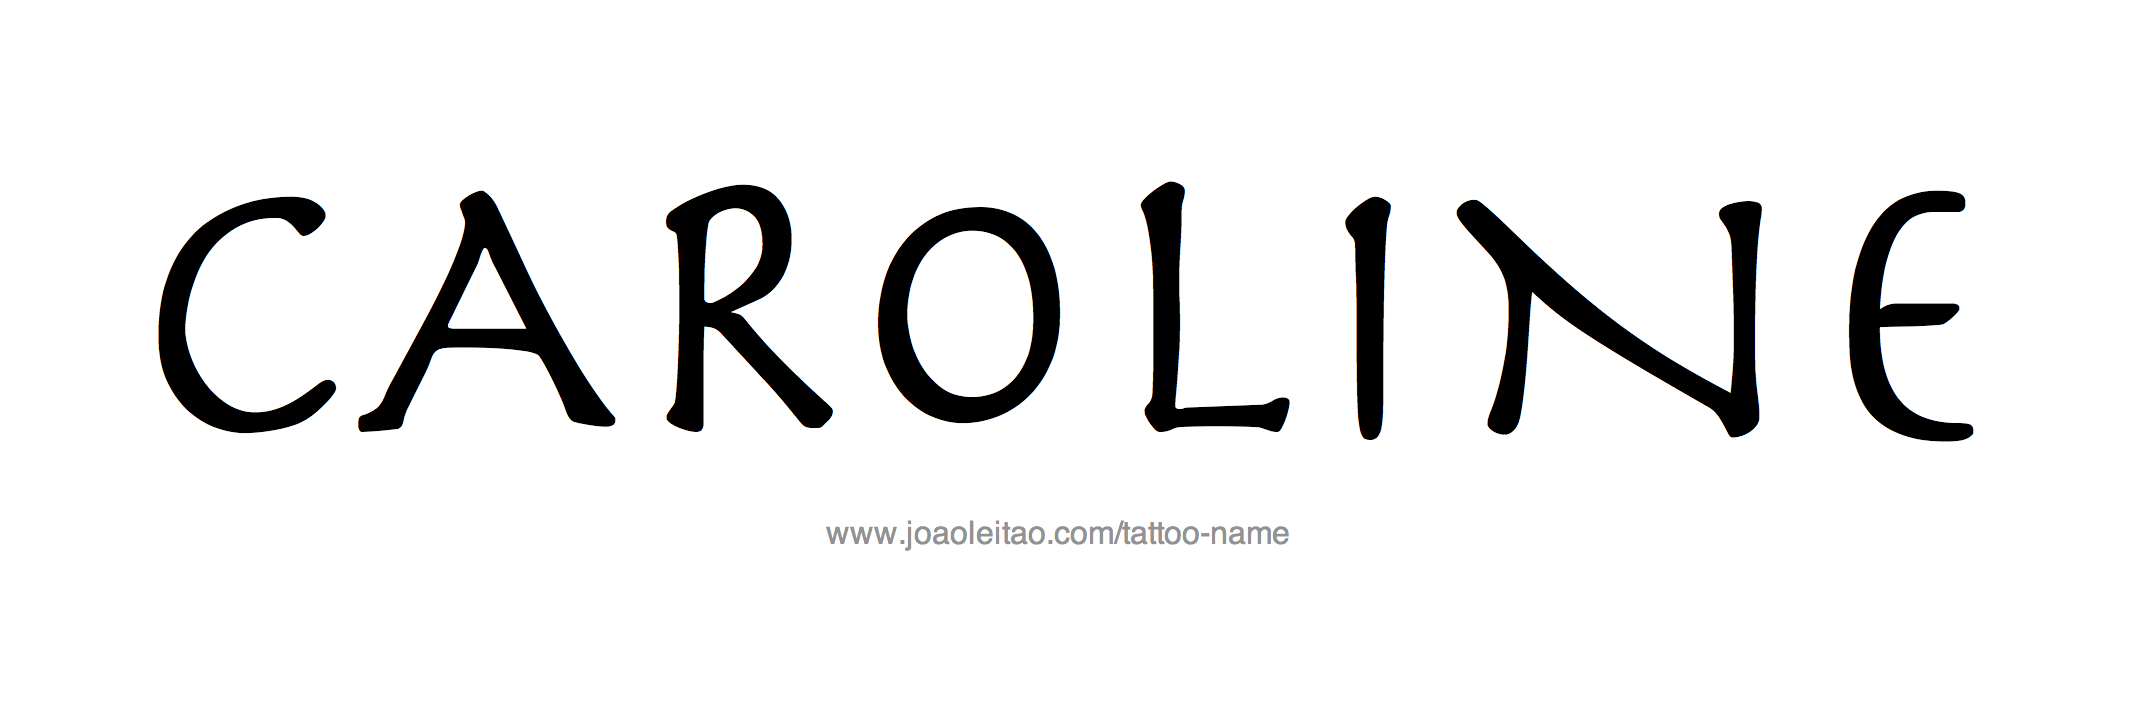 Name: Caroline Name Tattoo Designs